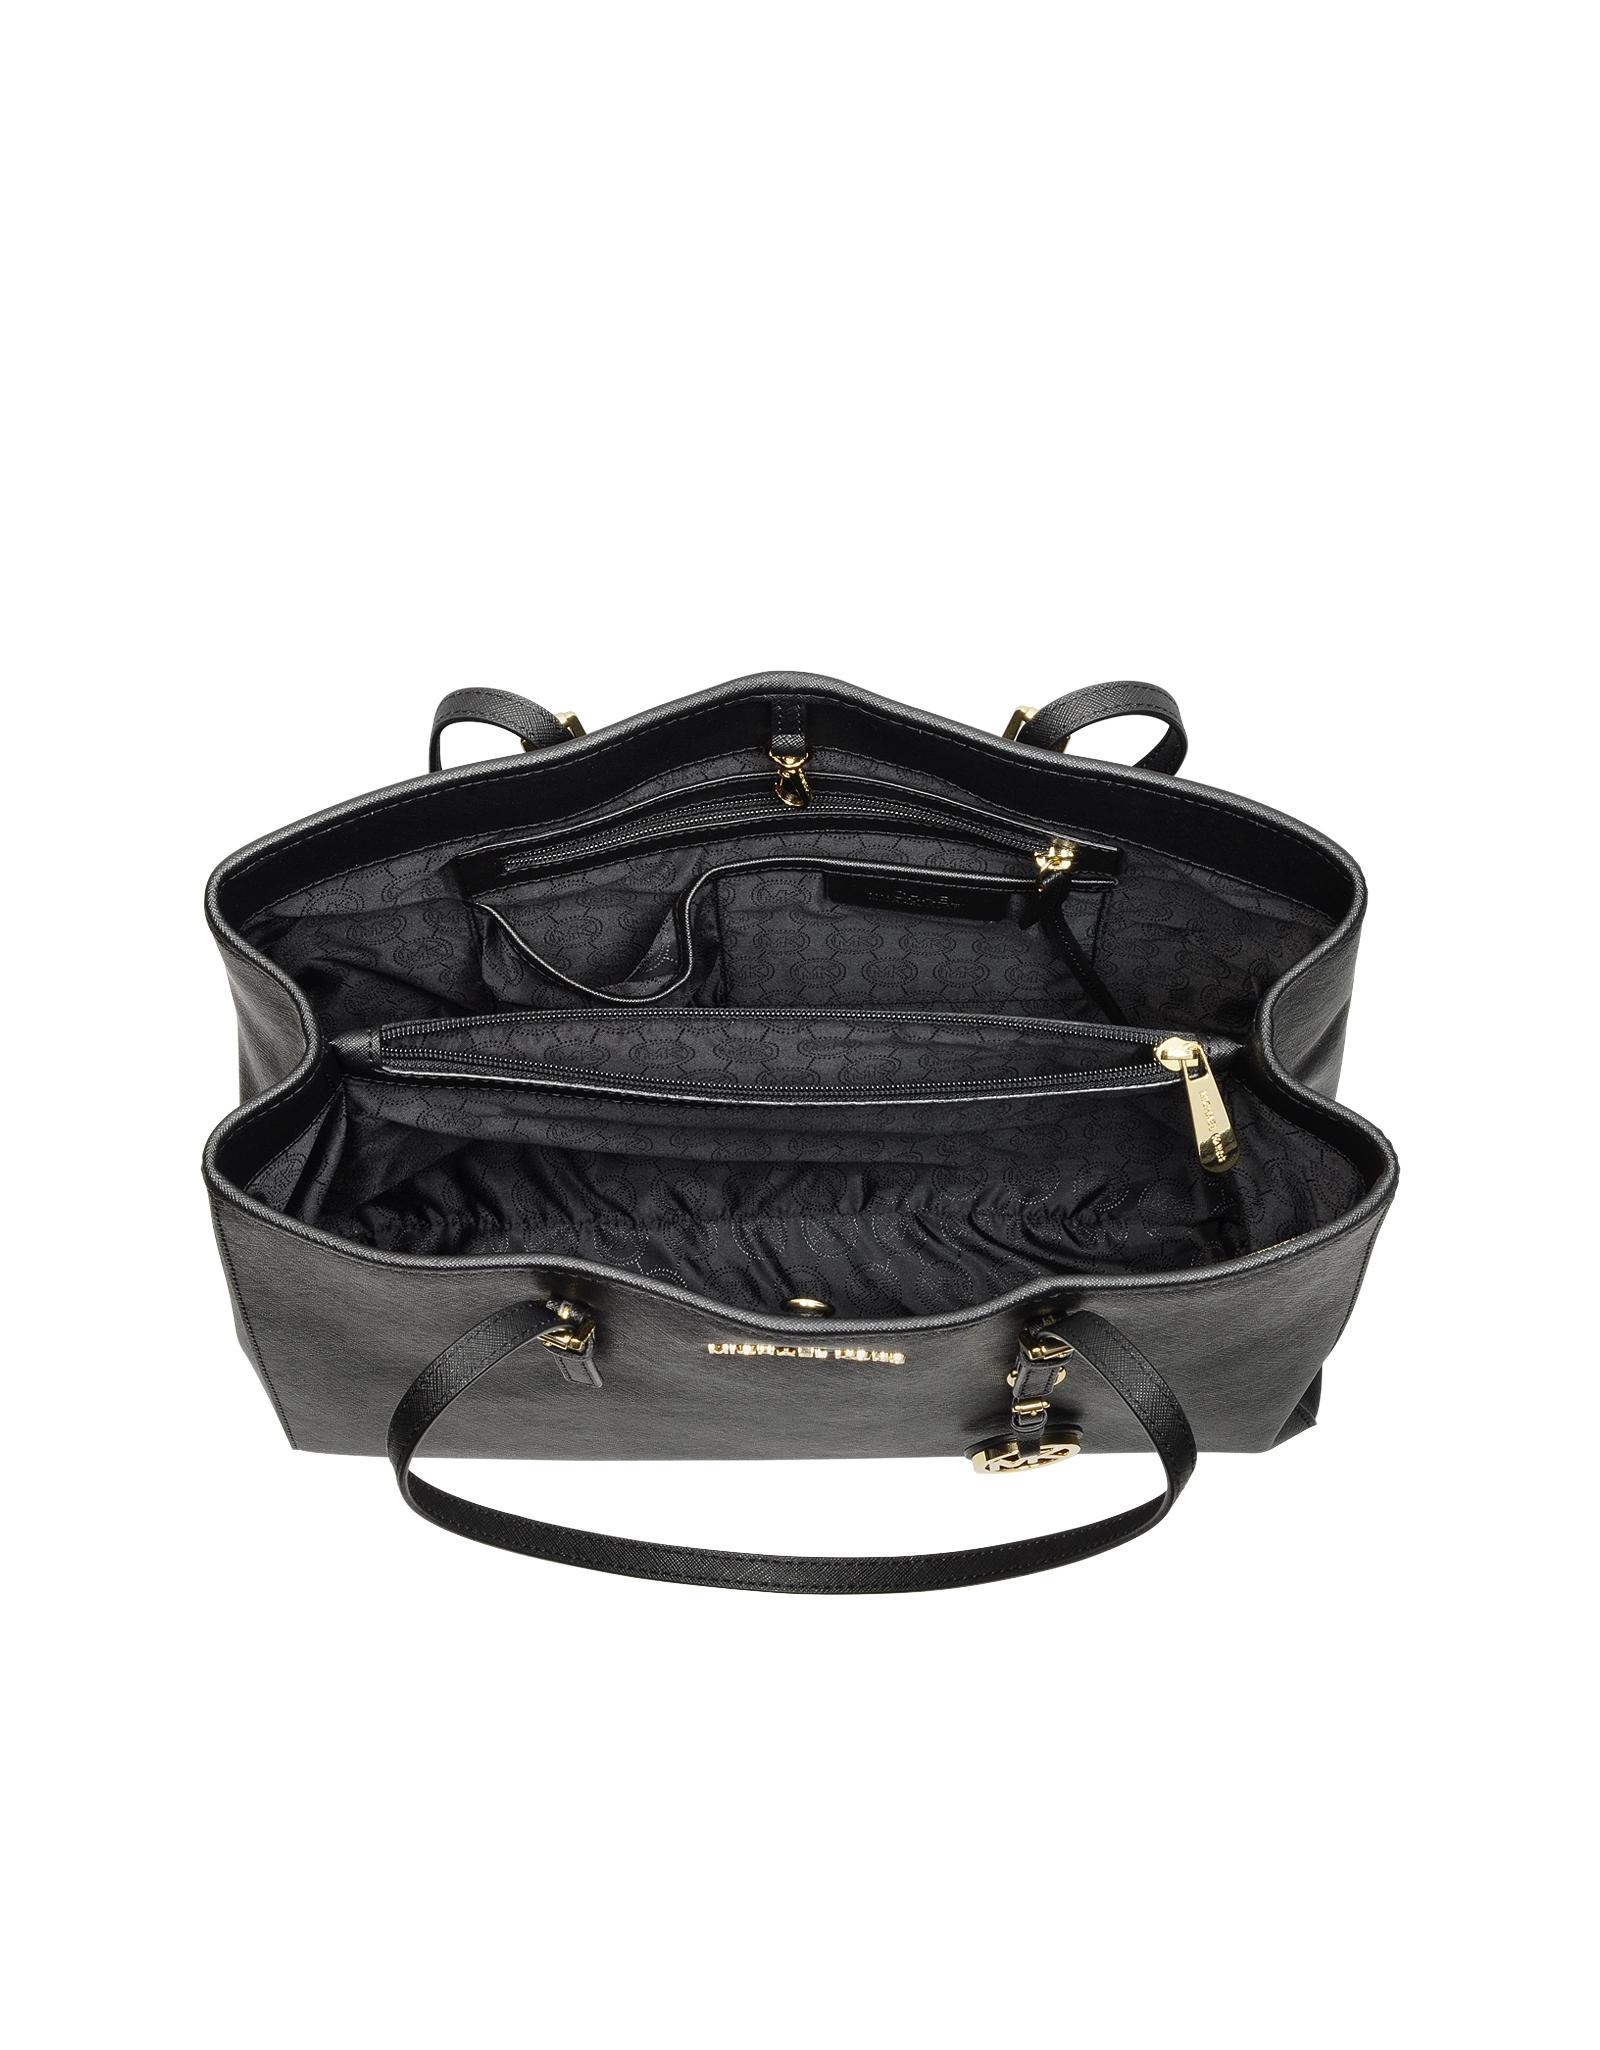 5251f2e7c0 Lyst - Michael Kors Jet Set Travel Saffiano Leather Tote in Black